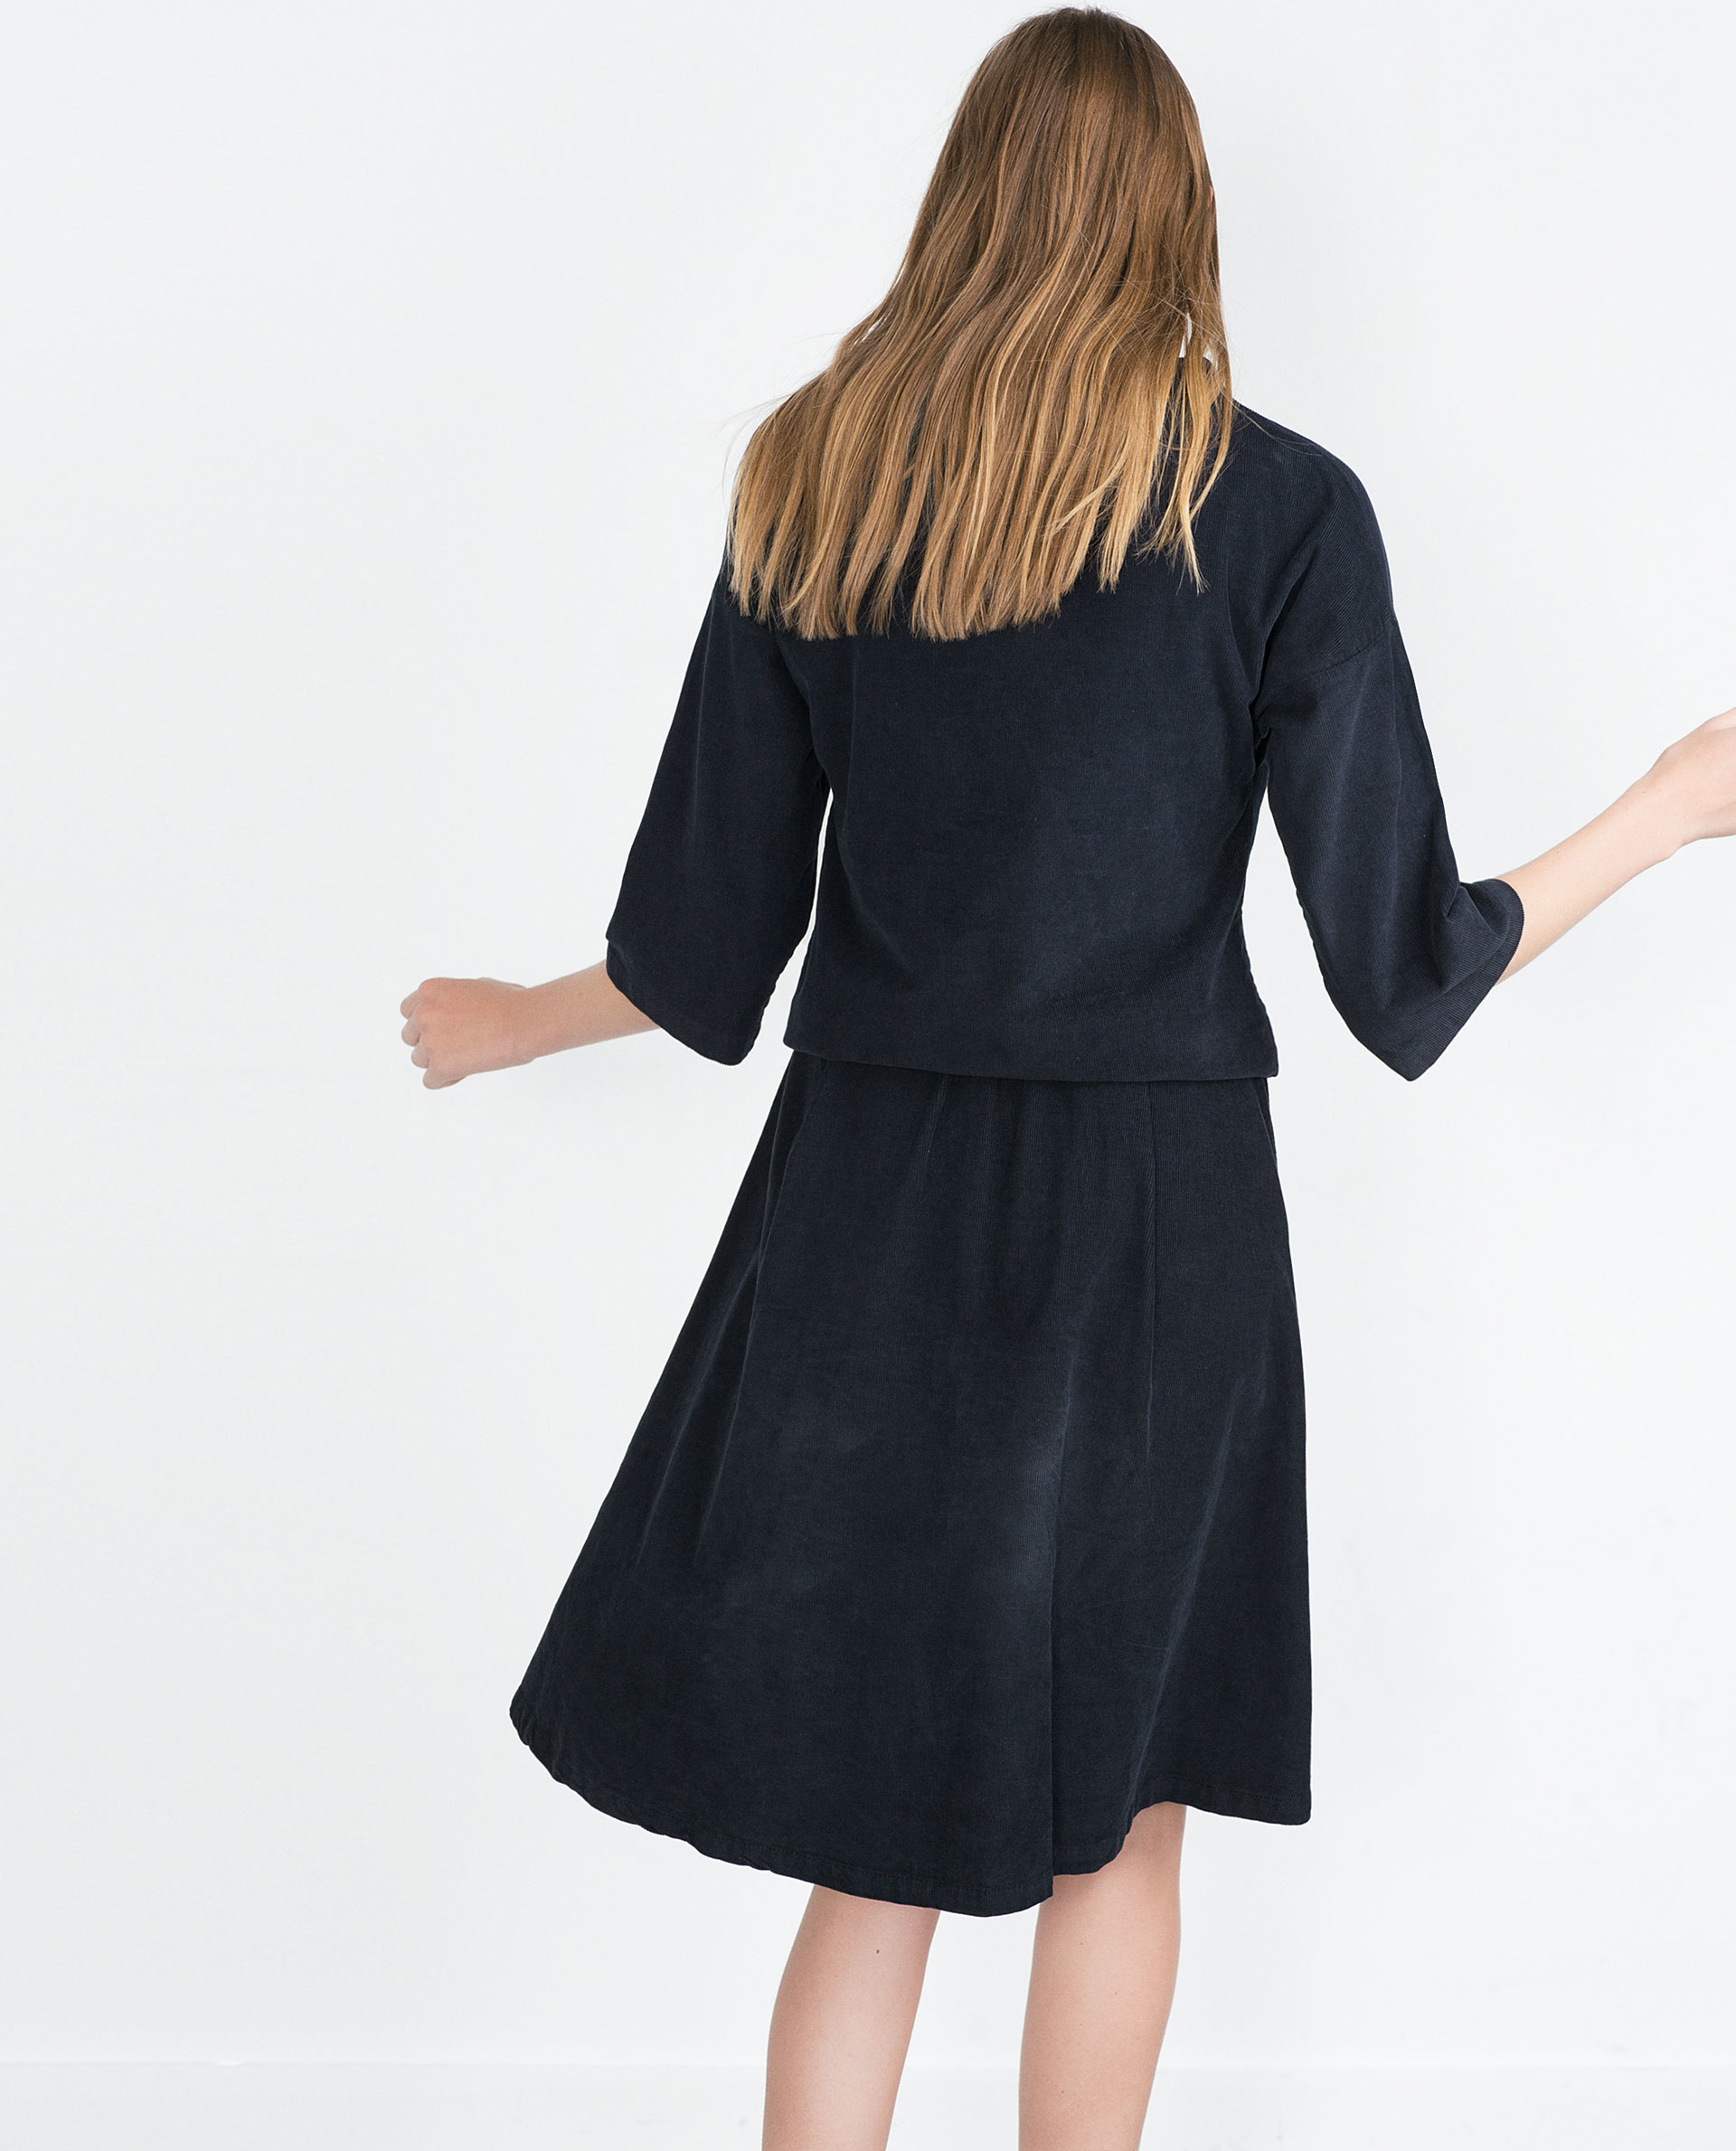 Blue Corduroy Skirt 16